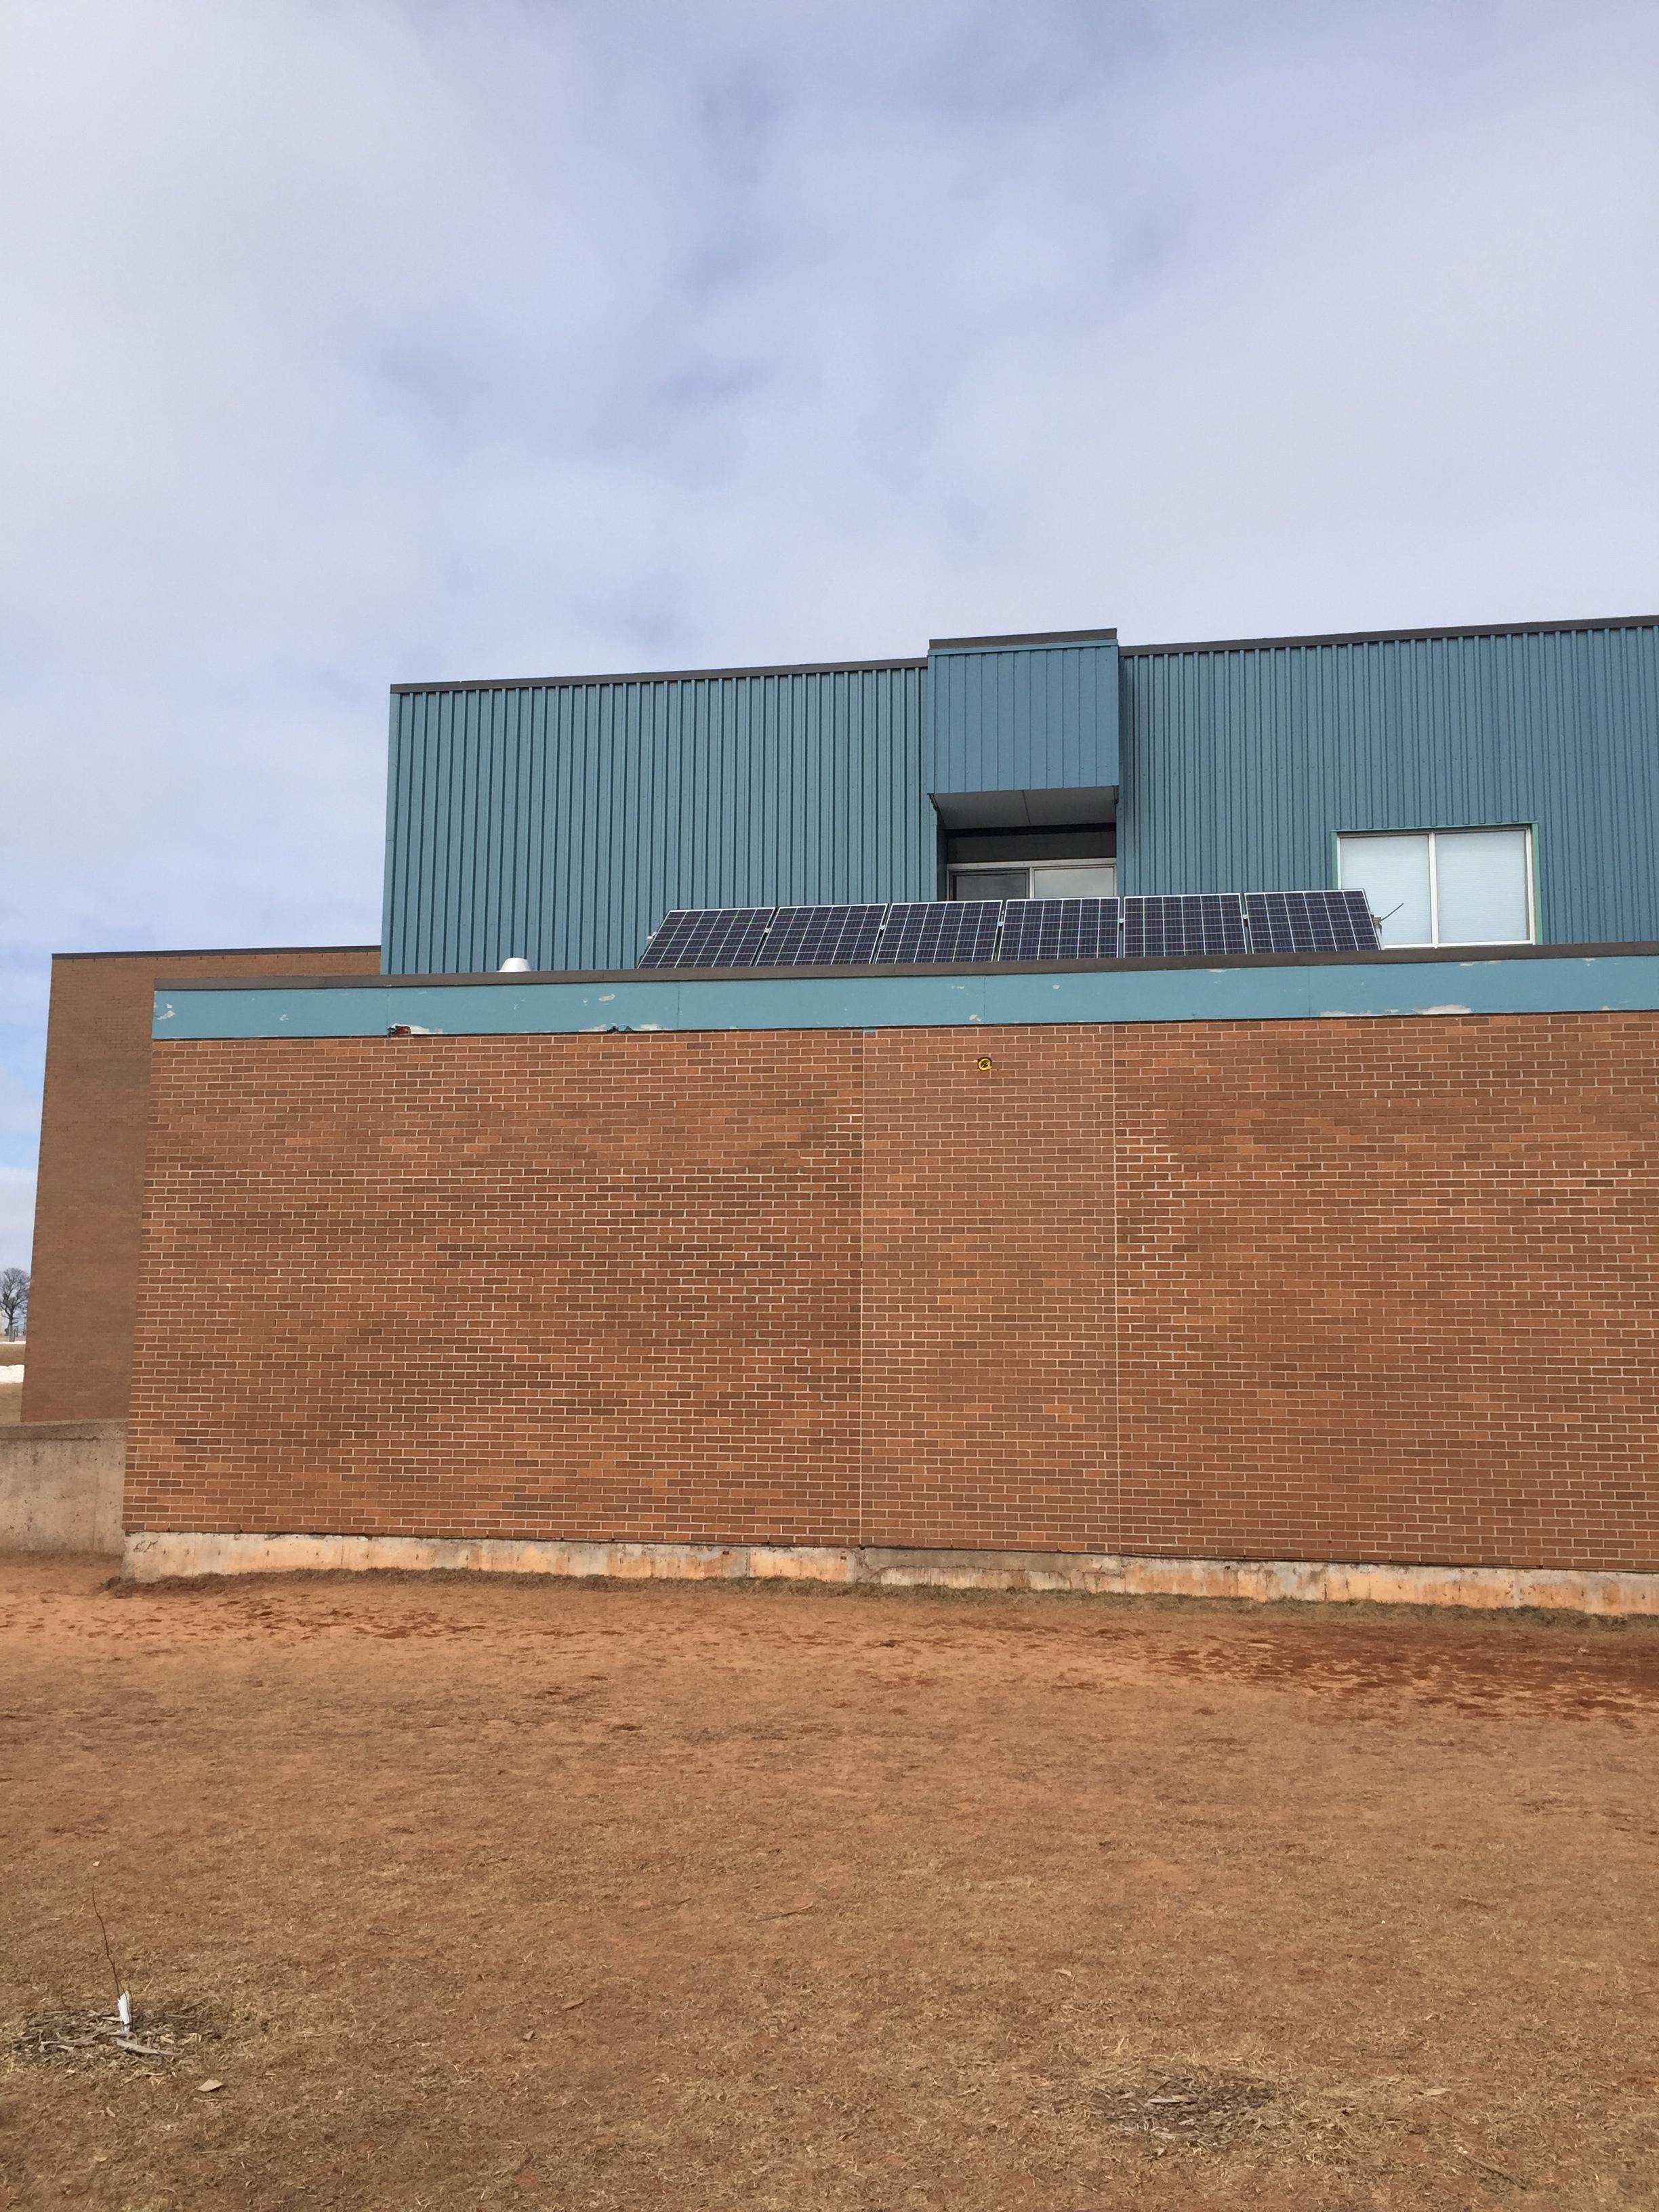 Eliot River Elementary School